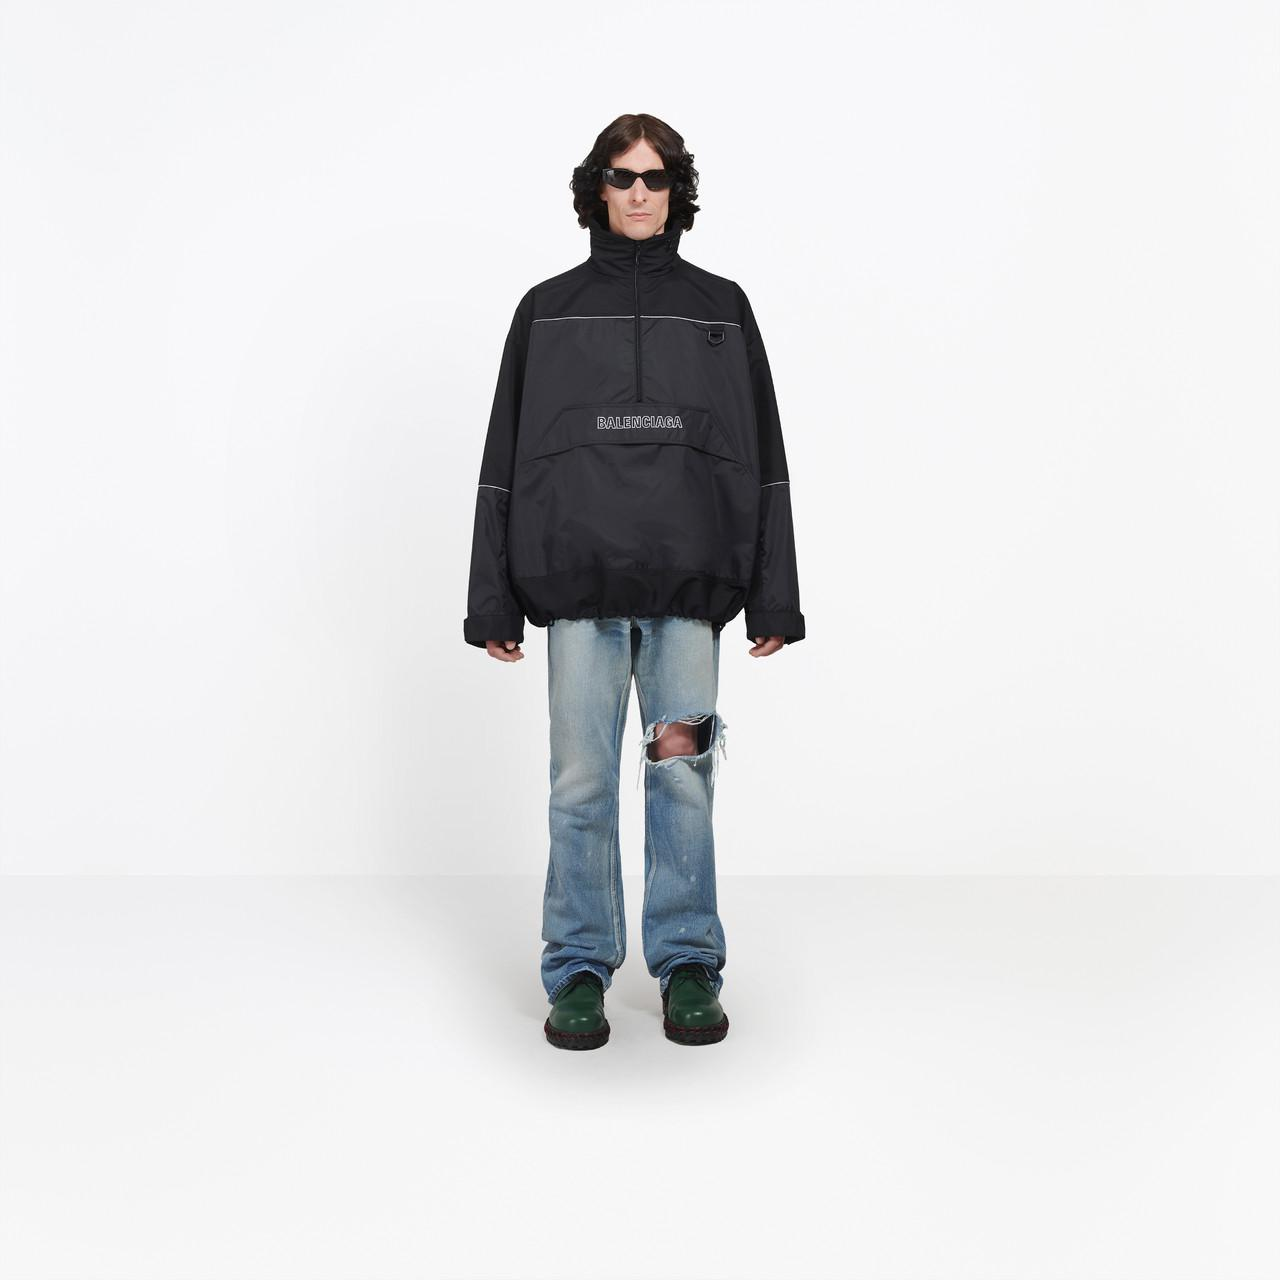 6ca40c6bc5a Balenciaga 80s Windbreaker in Black for Men - Lyst